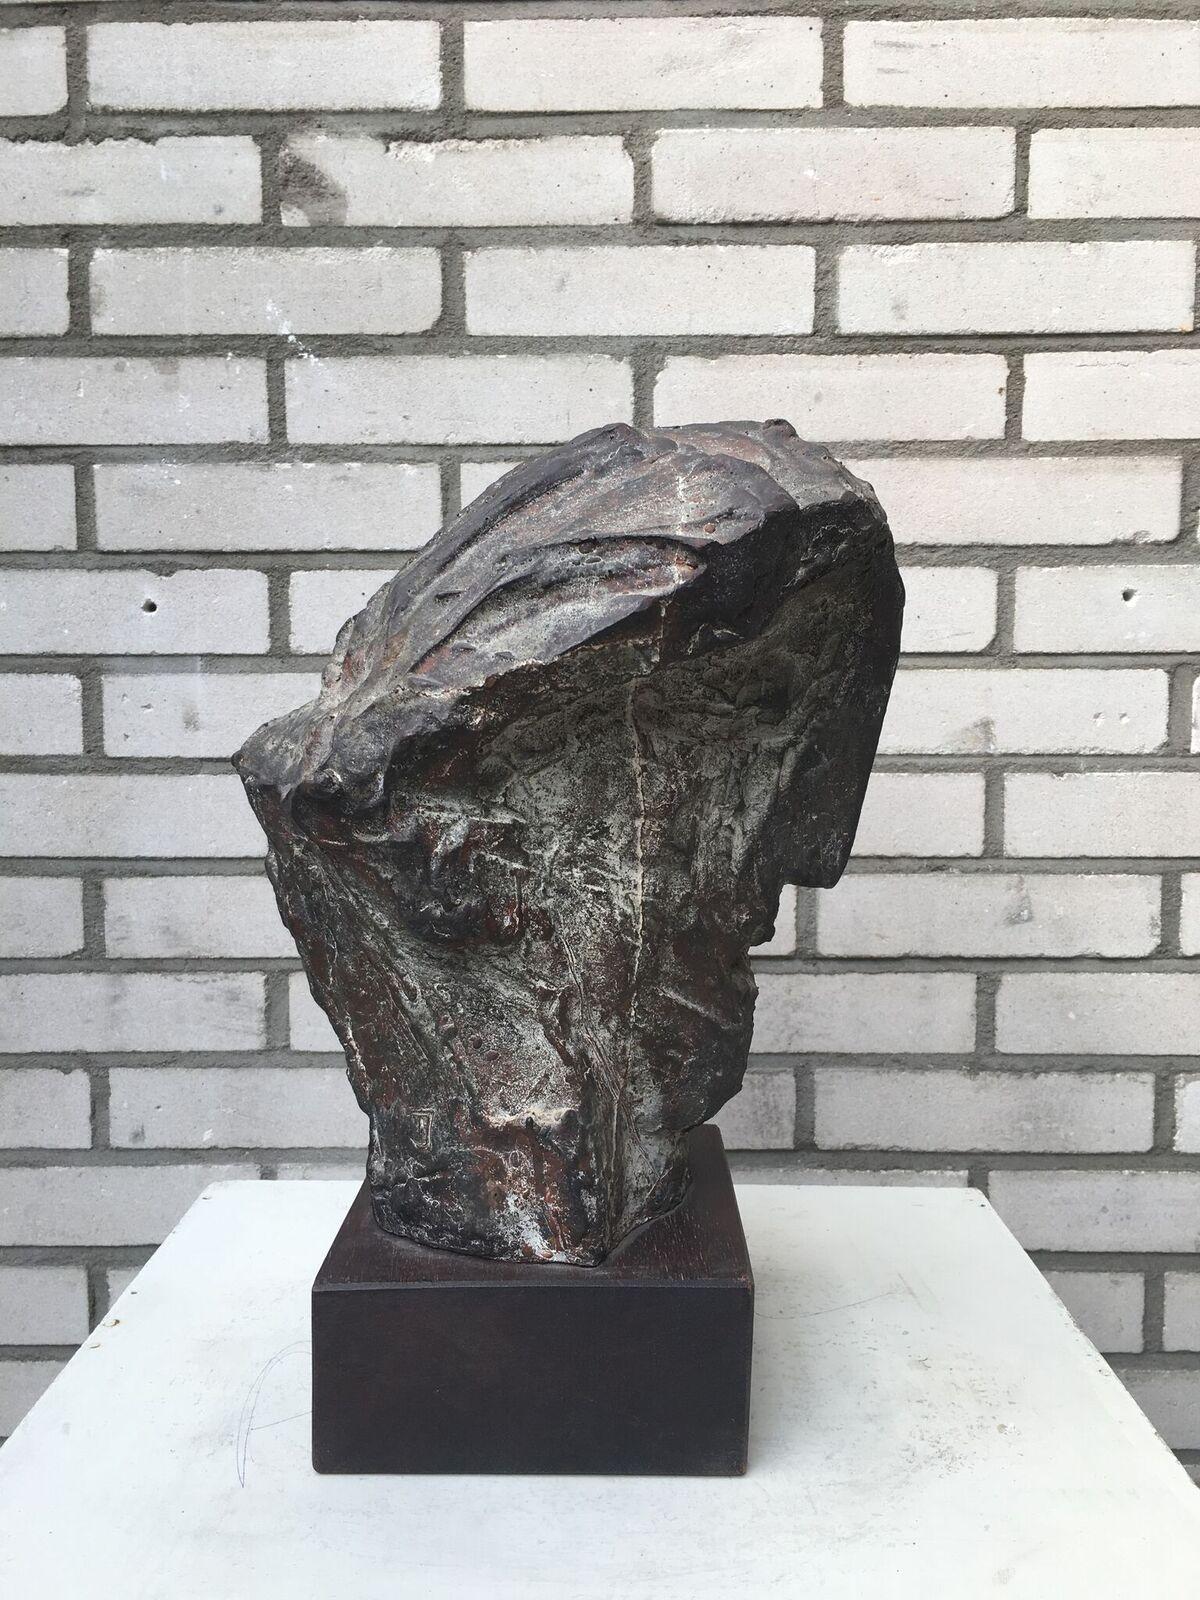 Thomas Junghans PORTRET VAN EEN ONBEKENDE (44) brons unicum h ca 35cm_preview